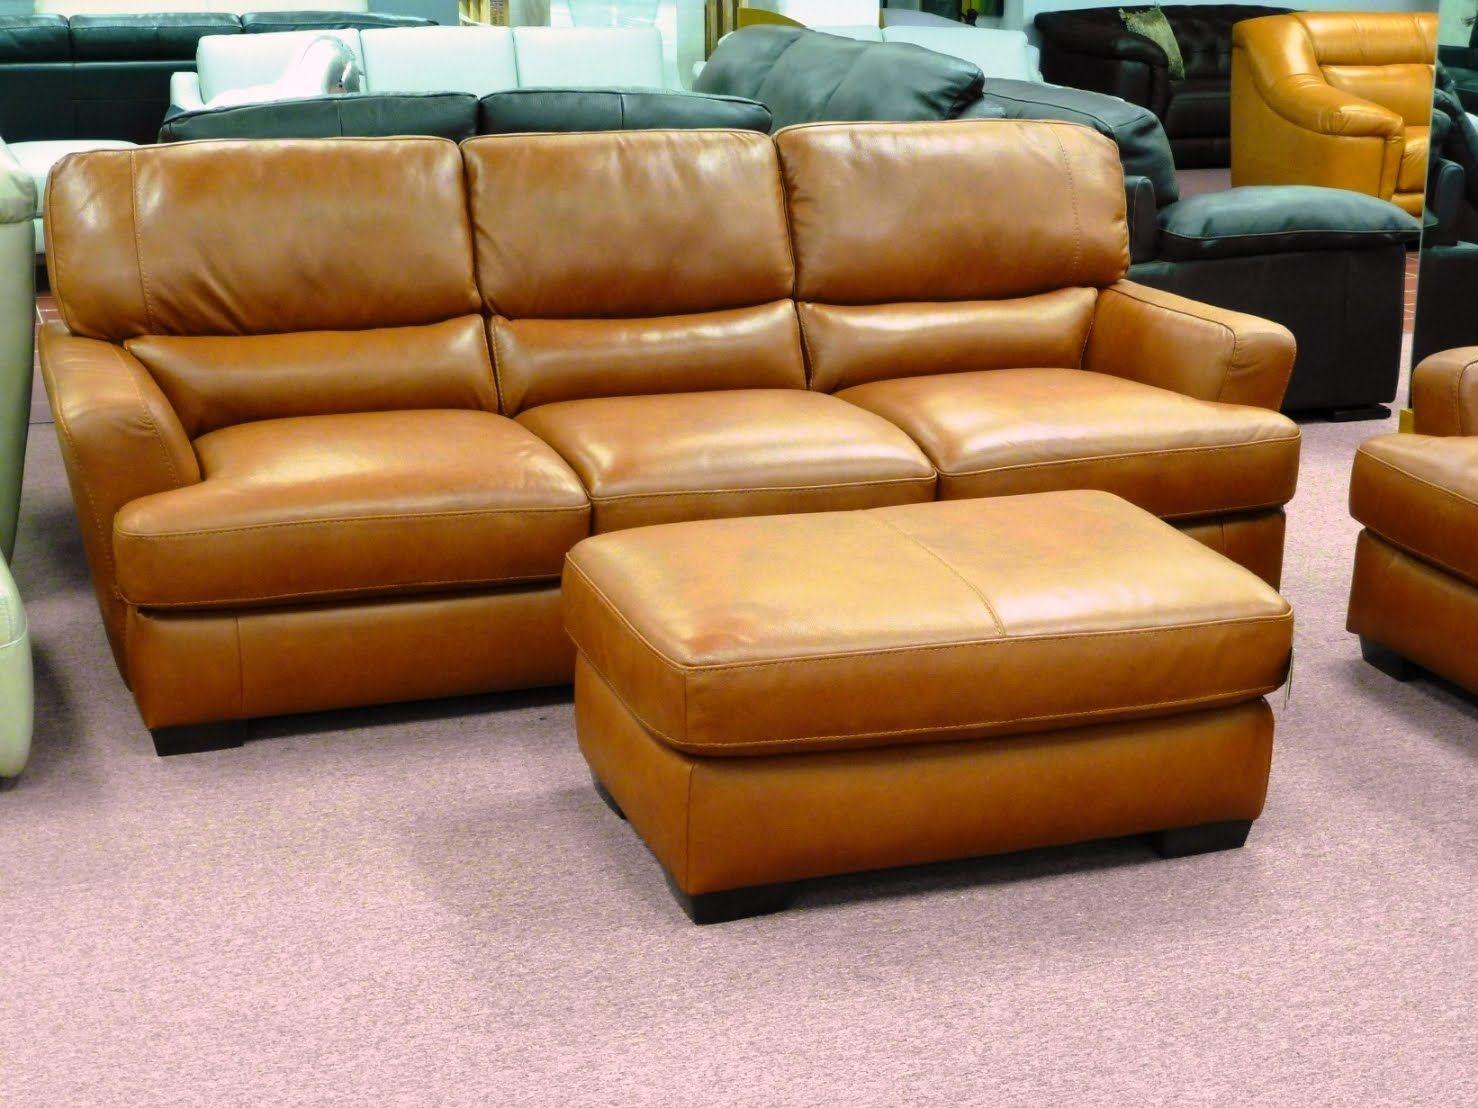 17 beste ideer om orange leather sofas p pinterest. Interior Design Ideas. Home Design Ideas